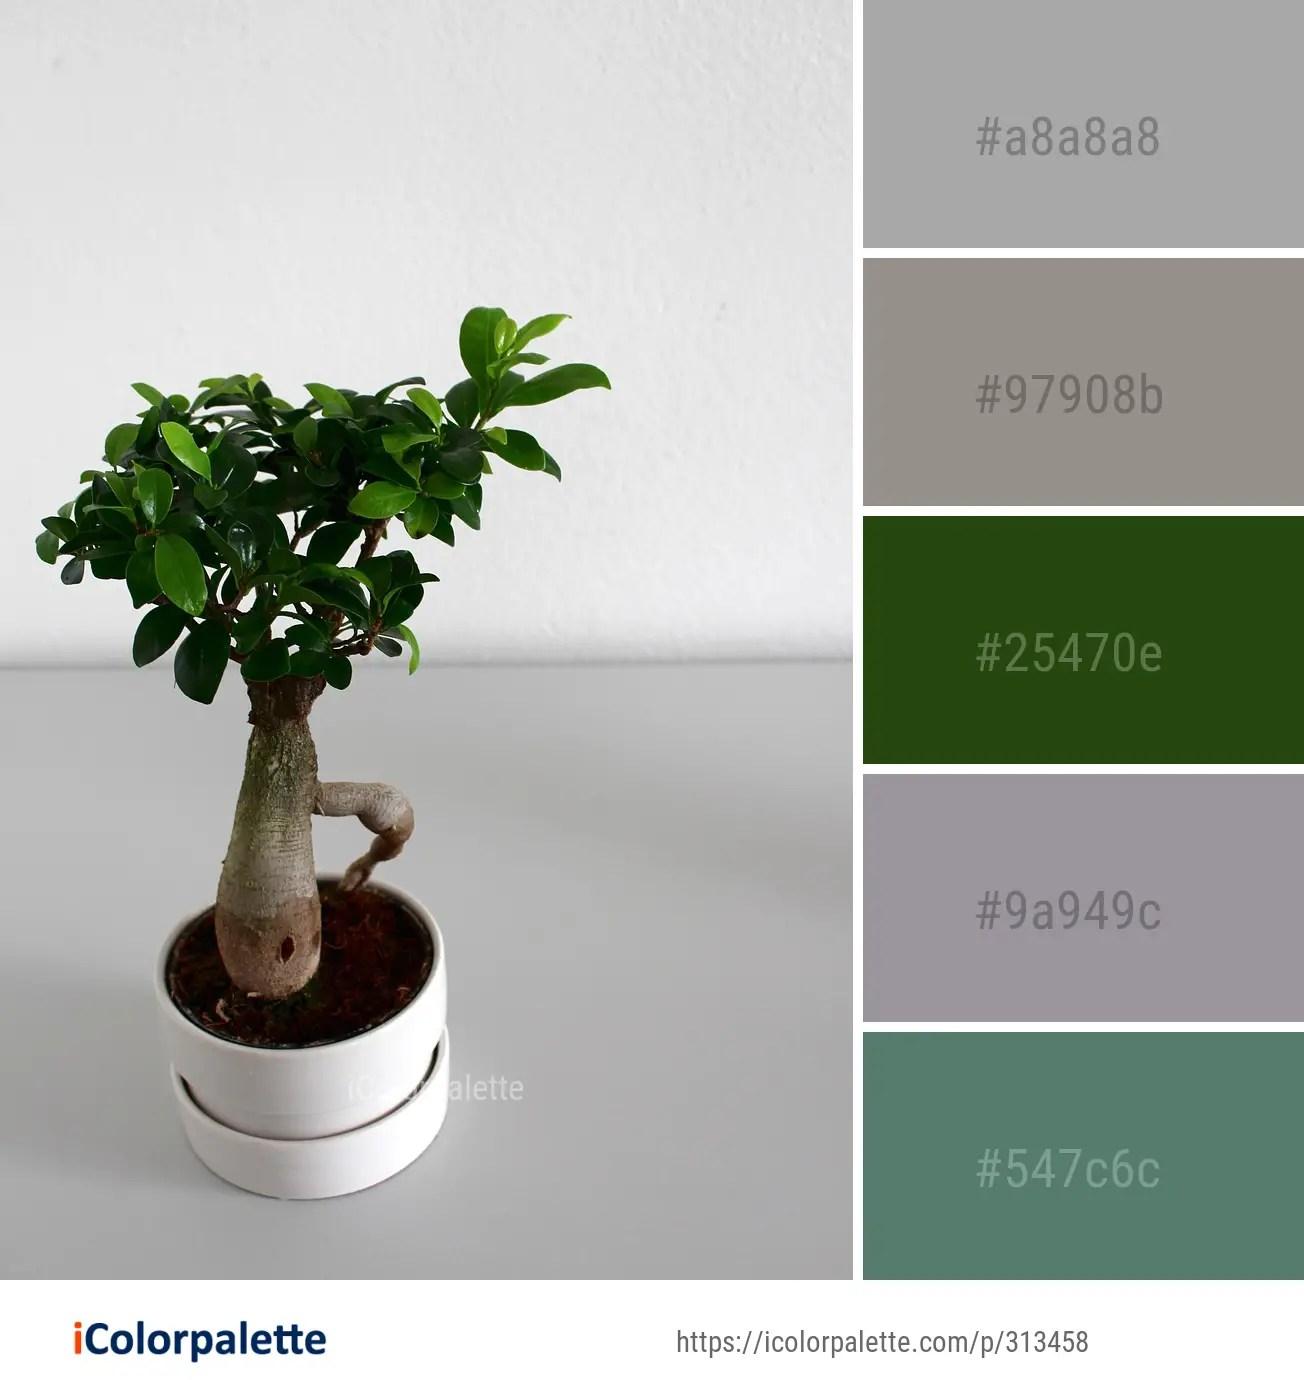 10 Bonsai Color Palette Ideas In 2021 Icolorpalette